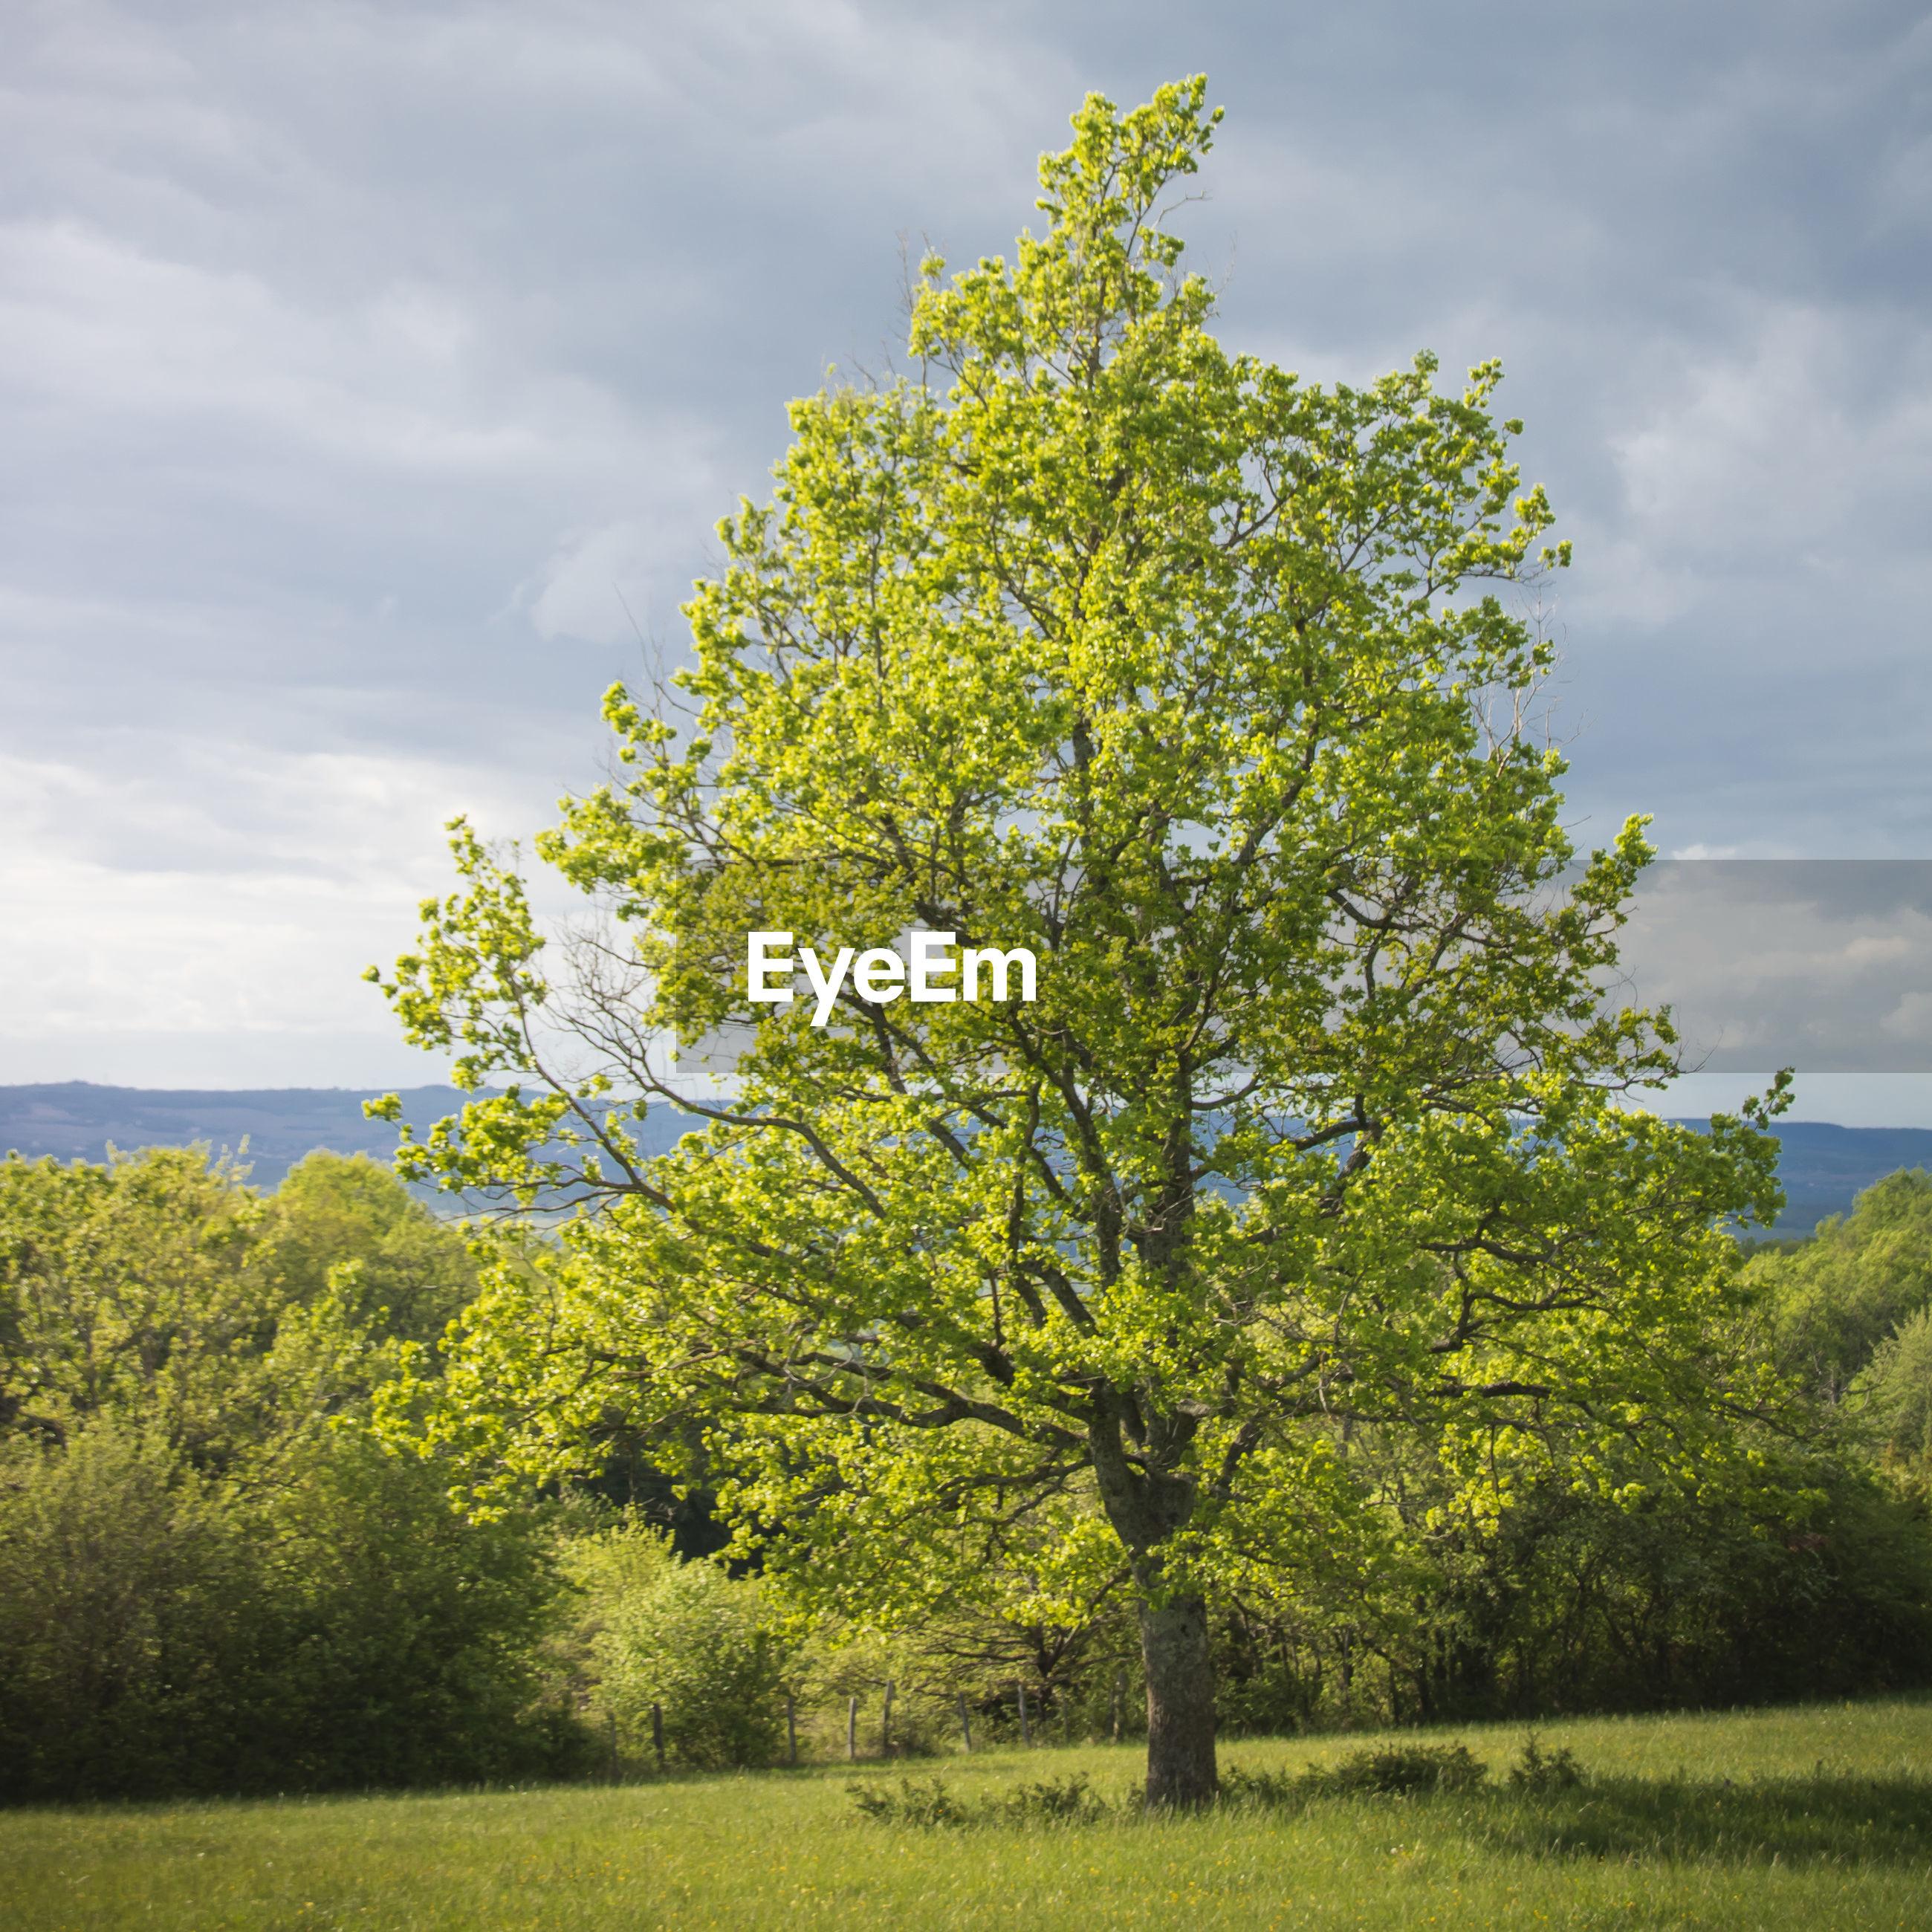 TREE BY PLANTS ON FIELD AGAINST SKY